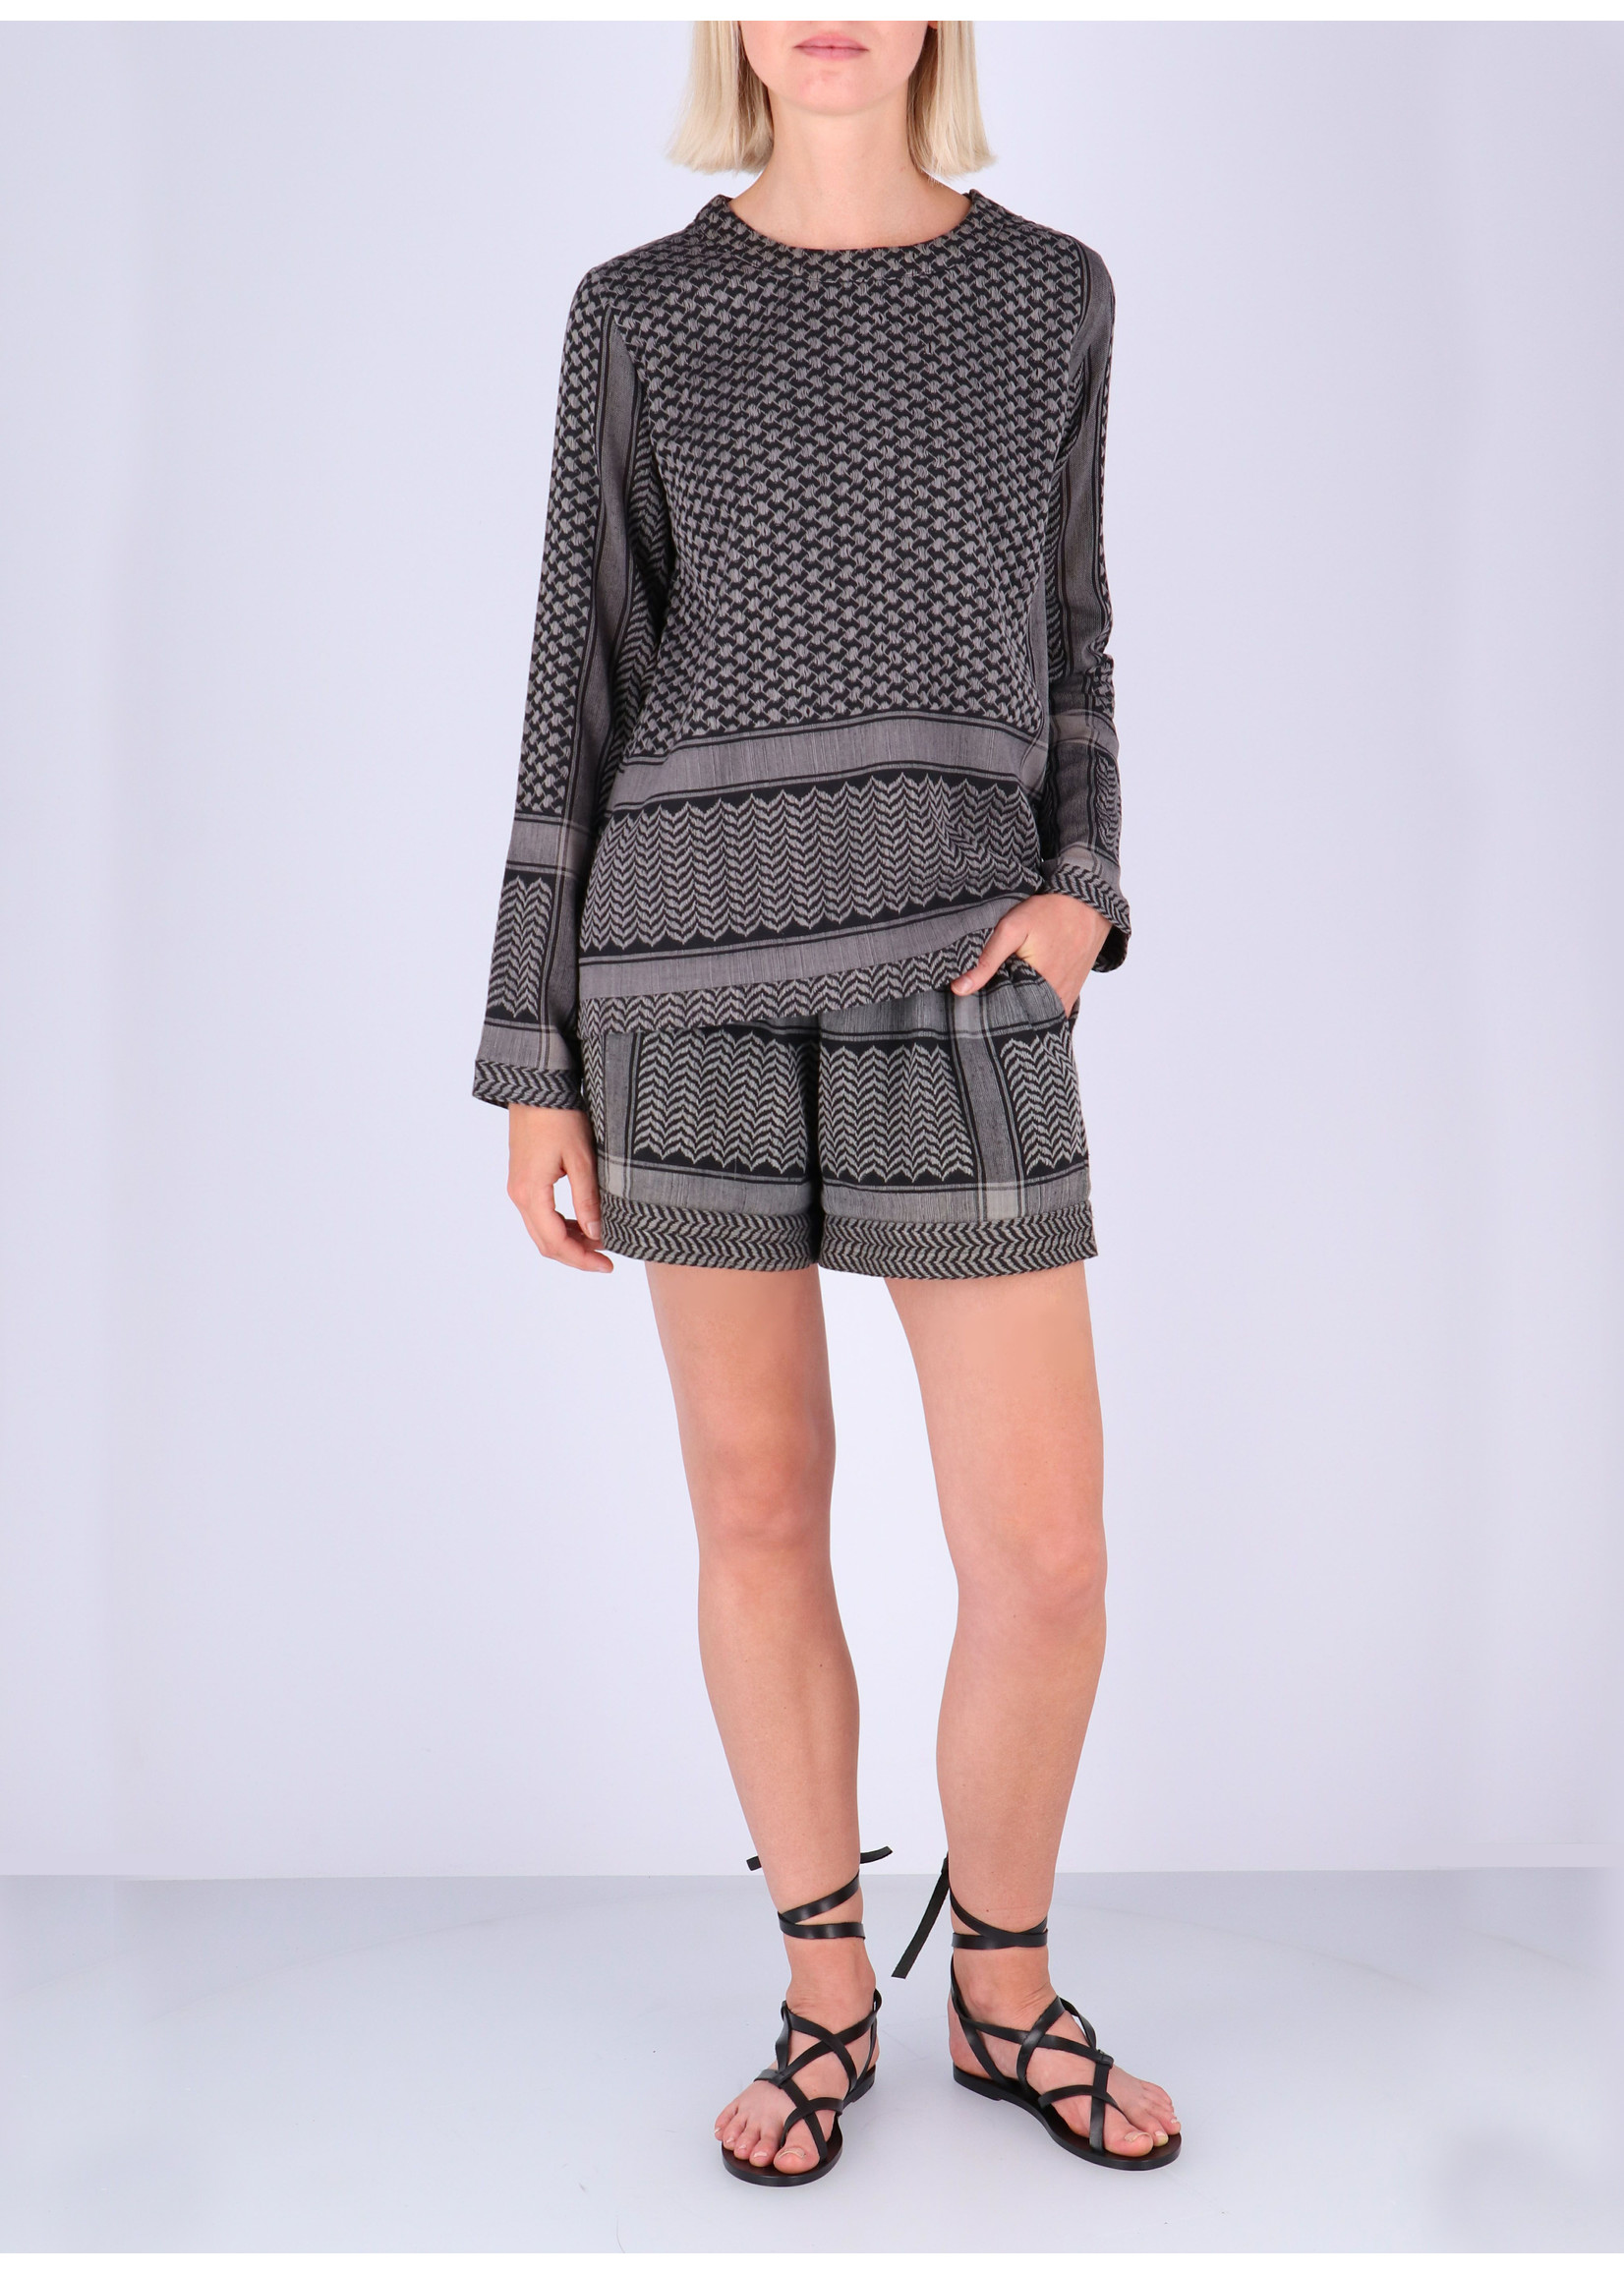 Rough Studios Devito shorts grey/black